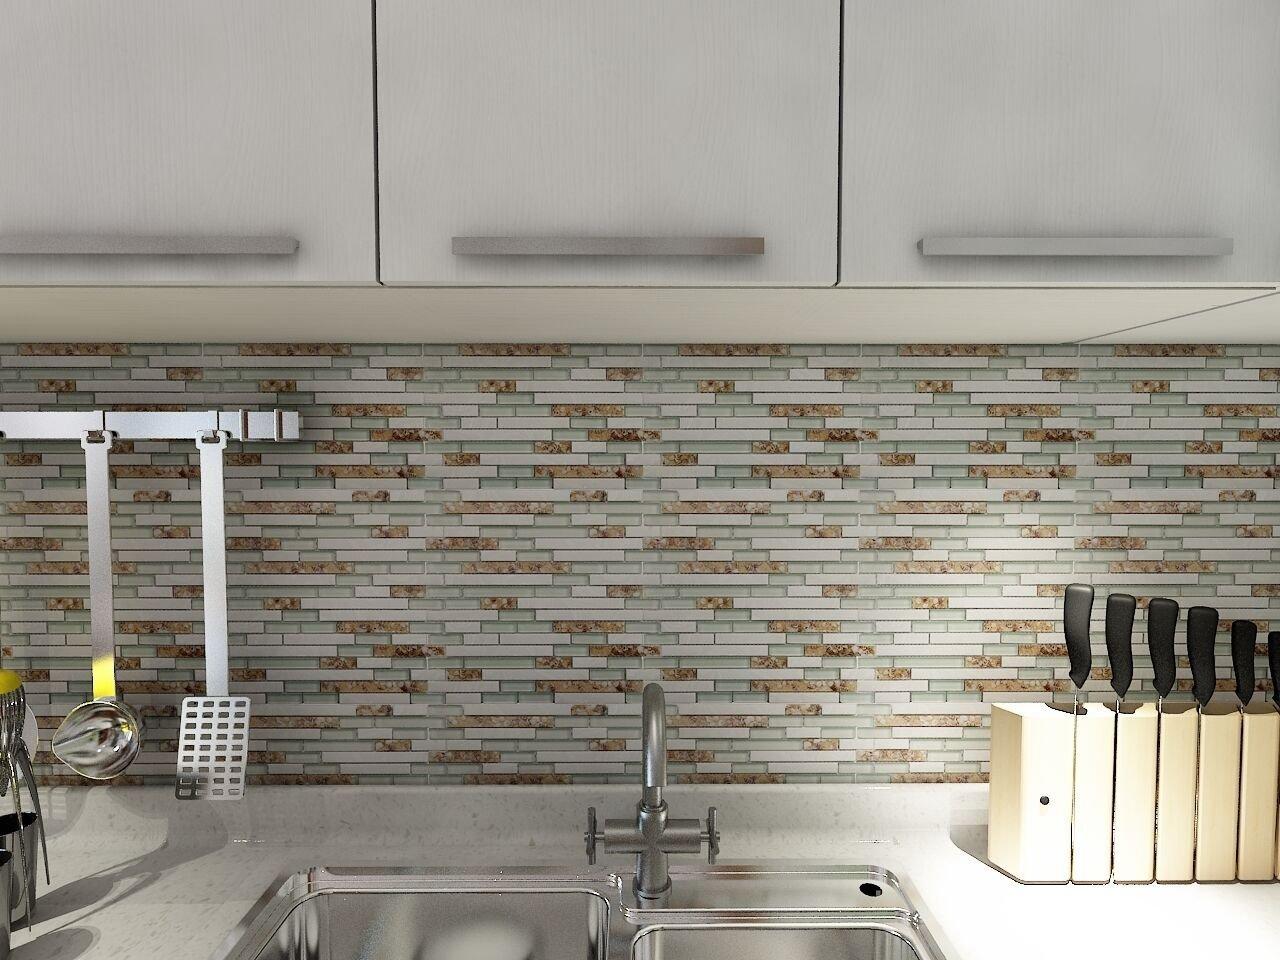 Glass Backsplash Tiles Installation Video